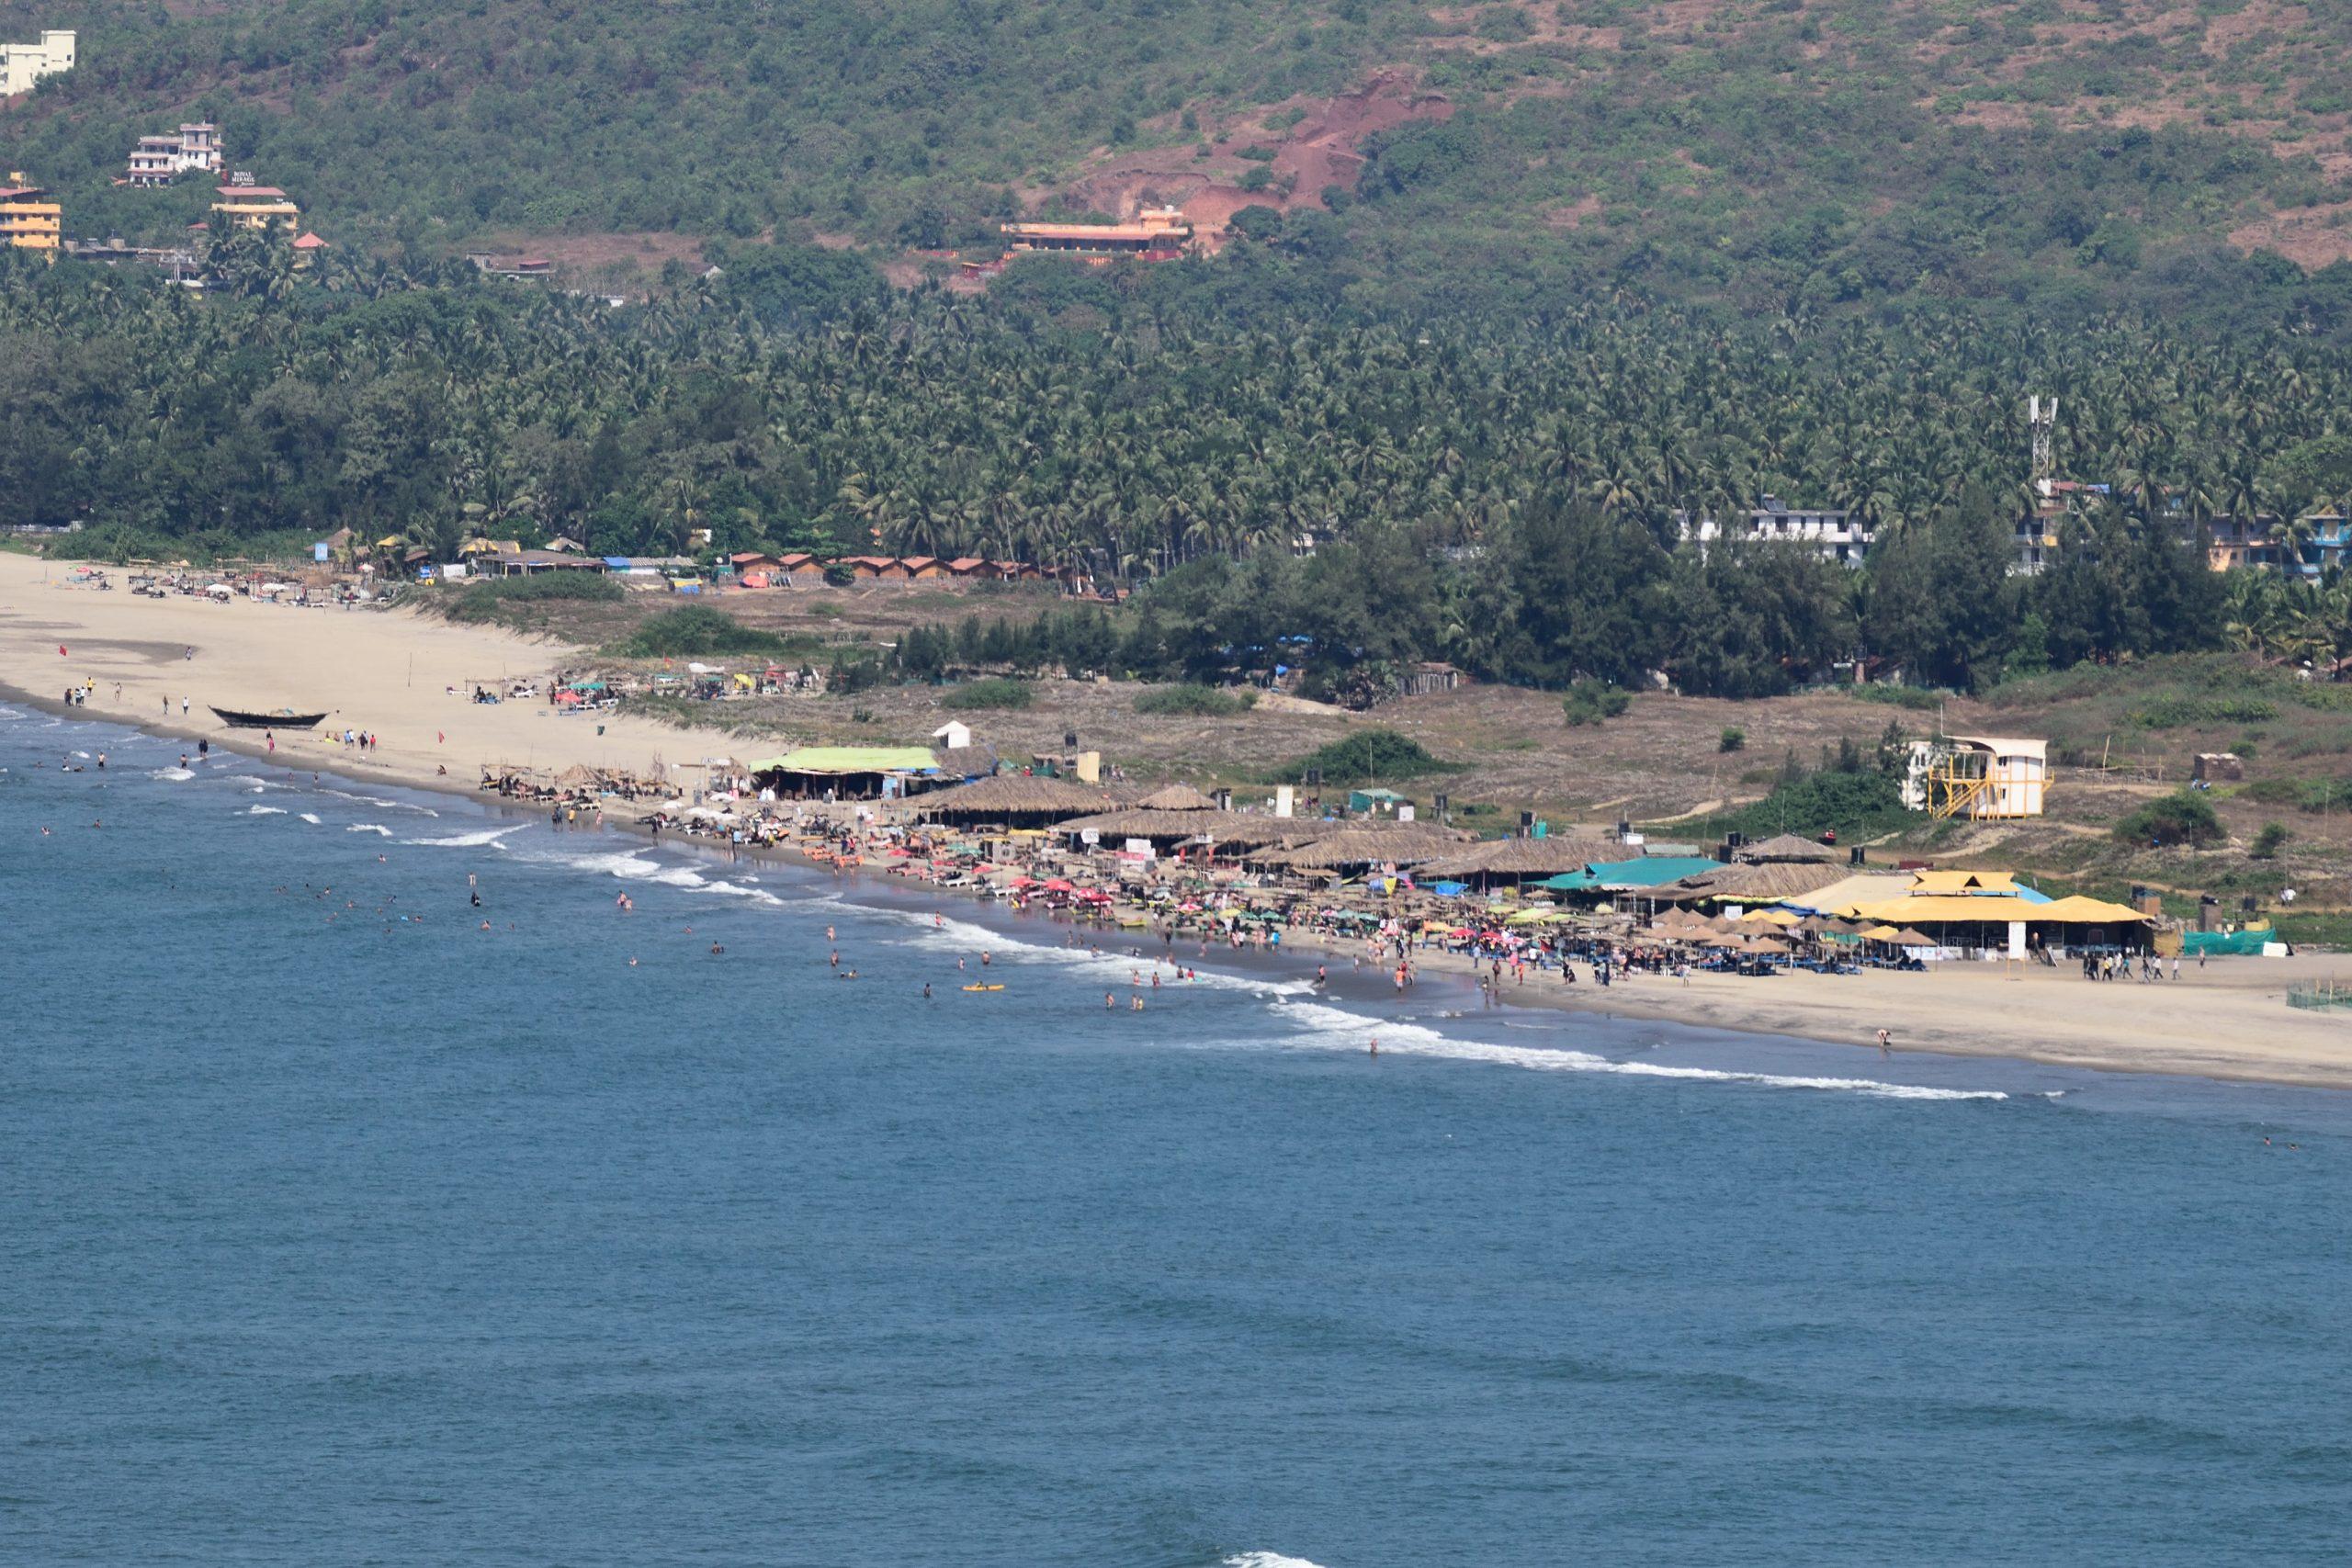 Get Some Vitamin Sea At This Best Beache in North Goa - Morjim Beach